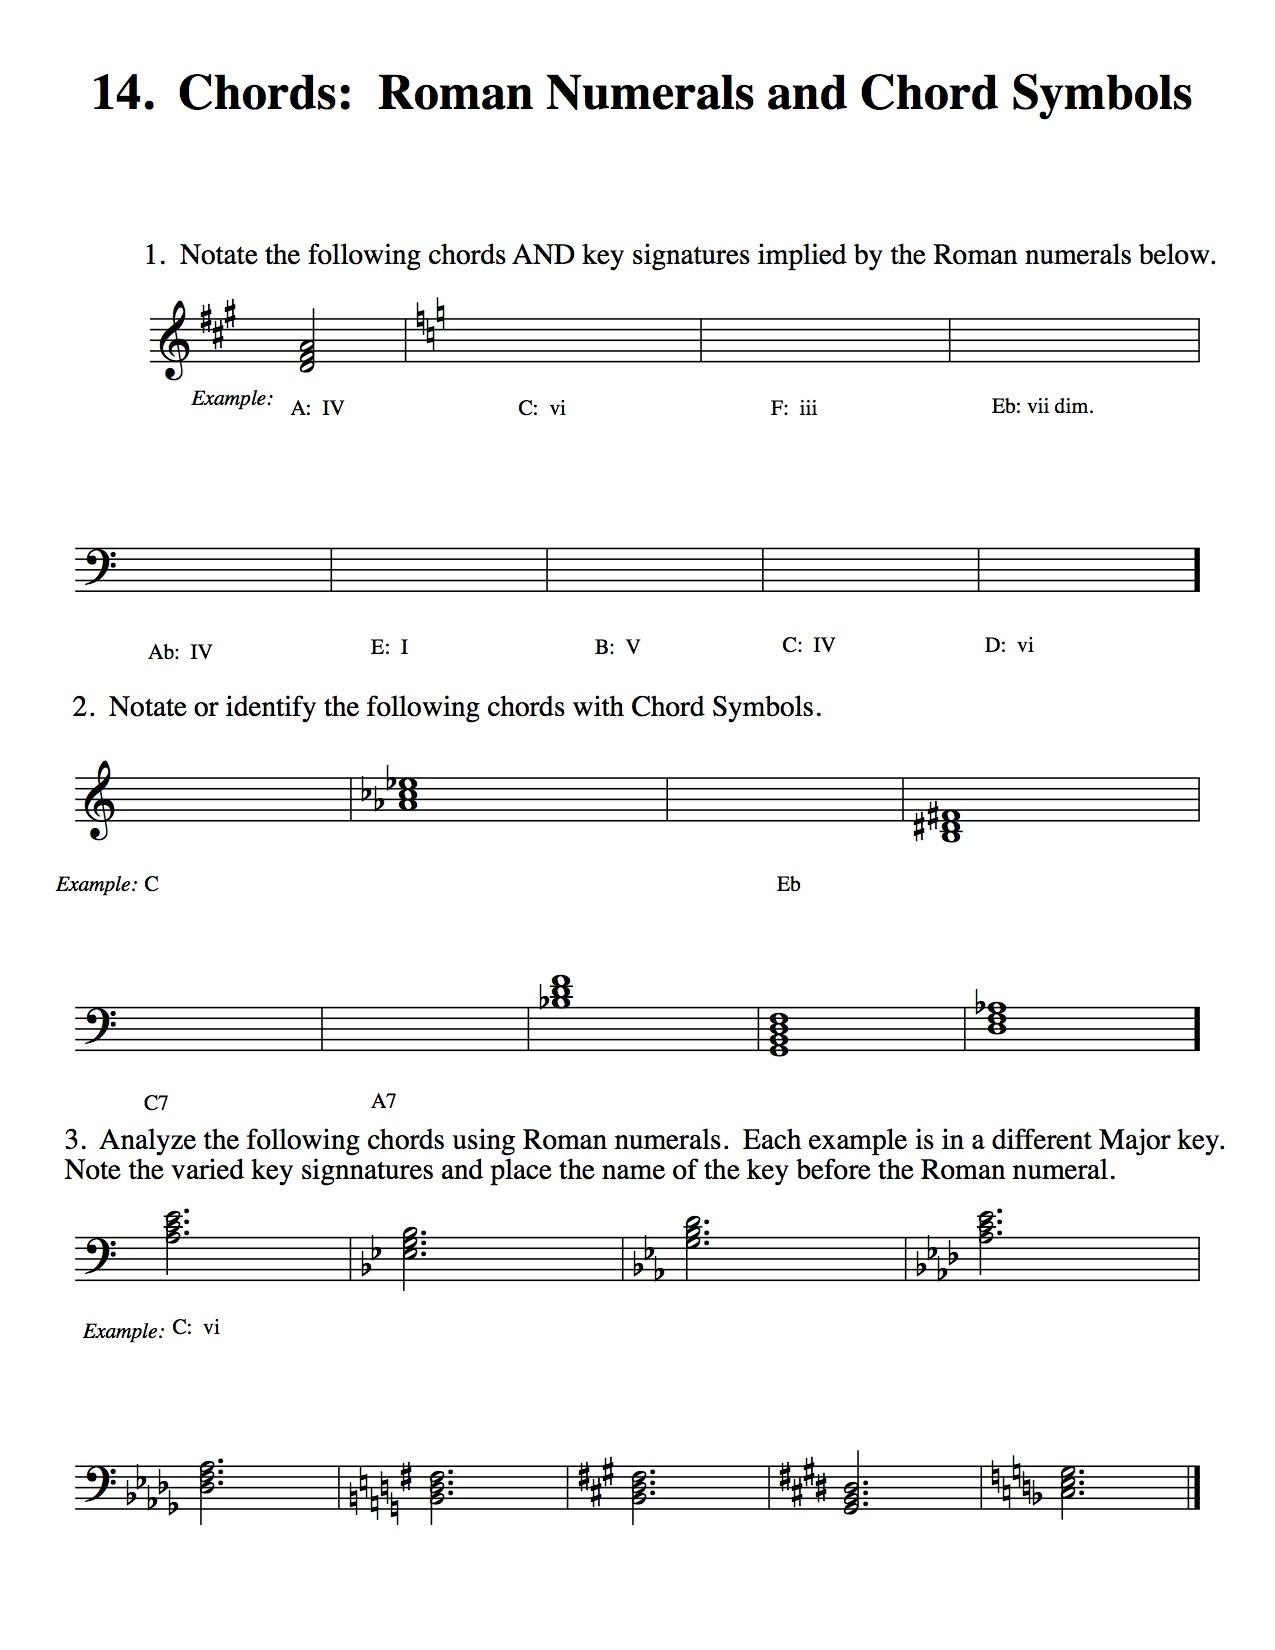 Park Arts Chords Roman Numerals And Chord Symbols